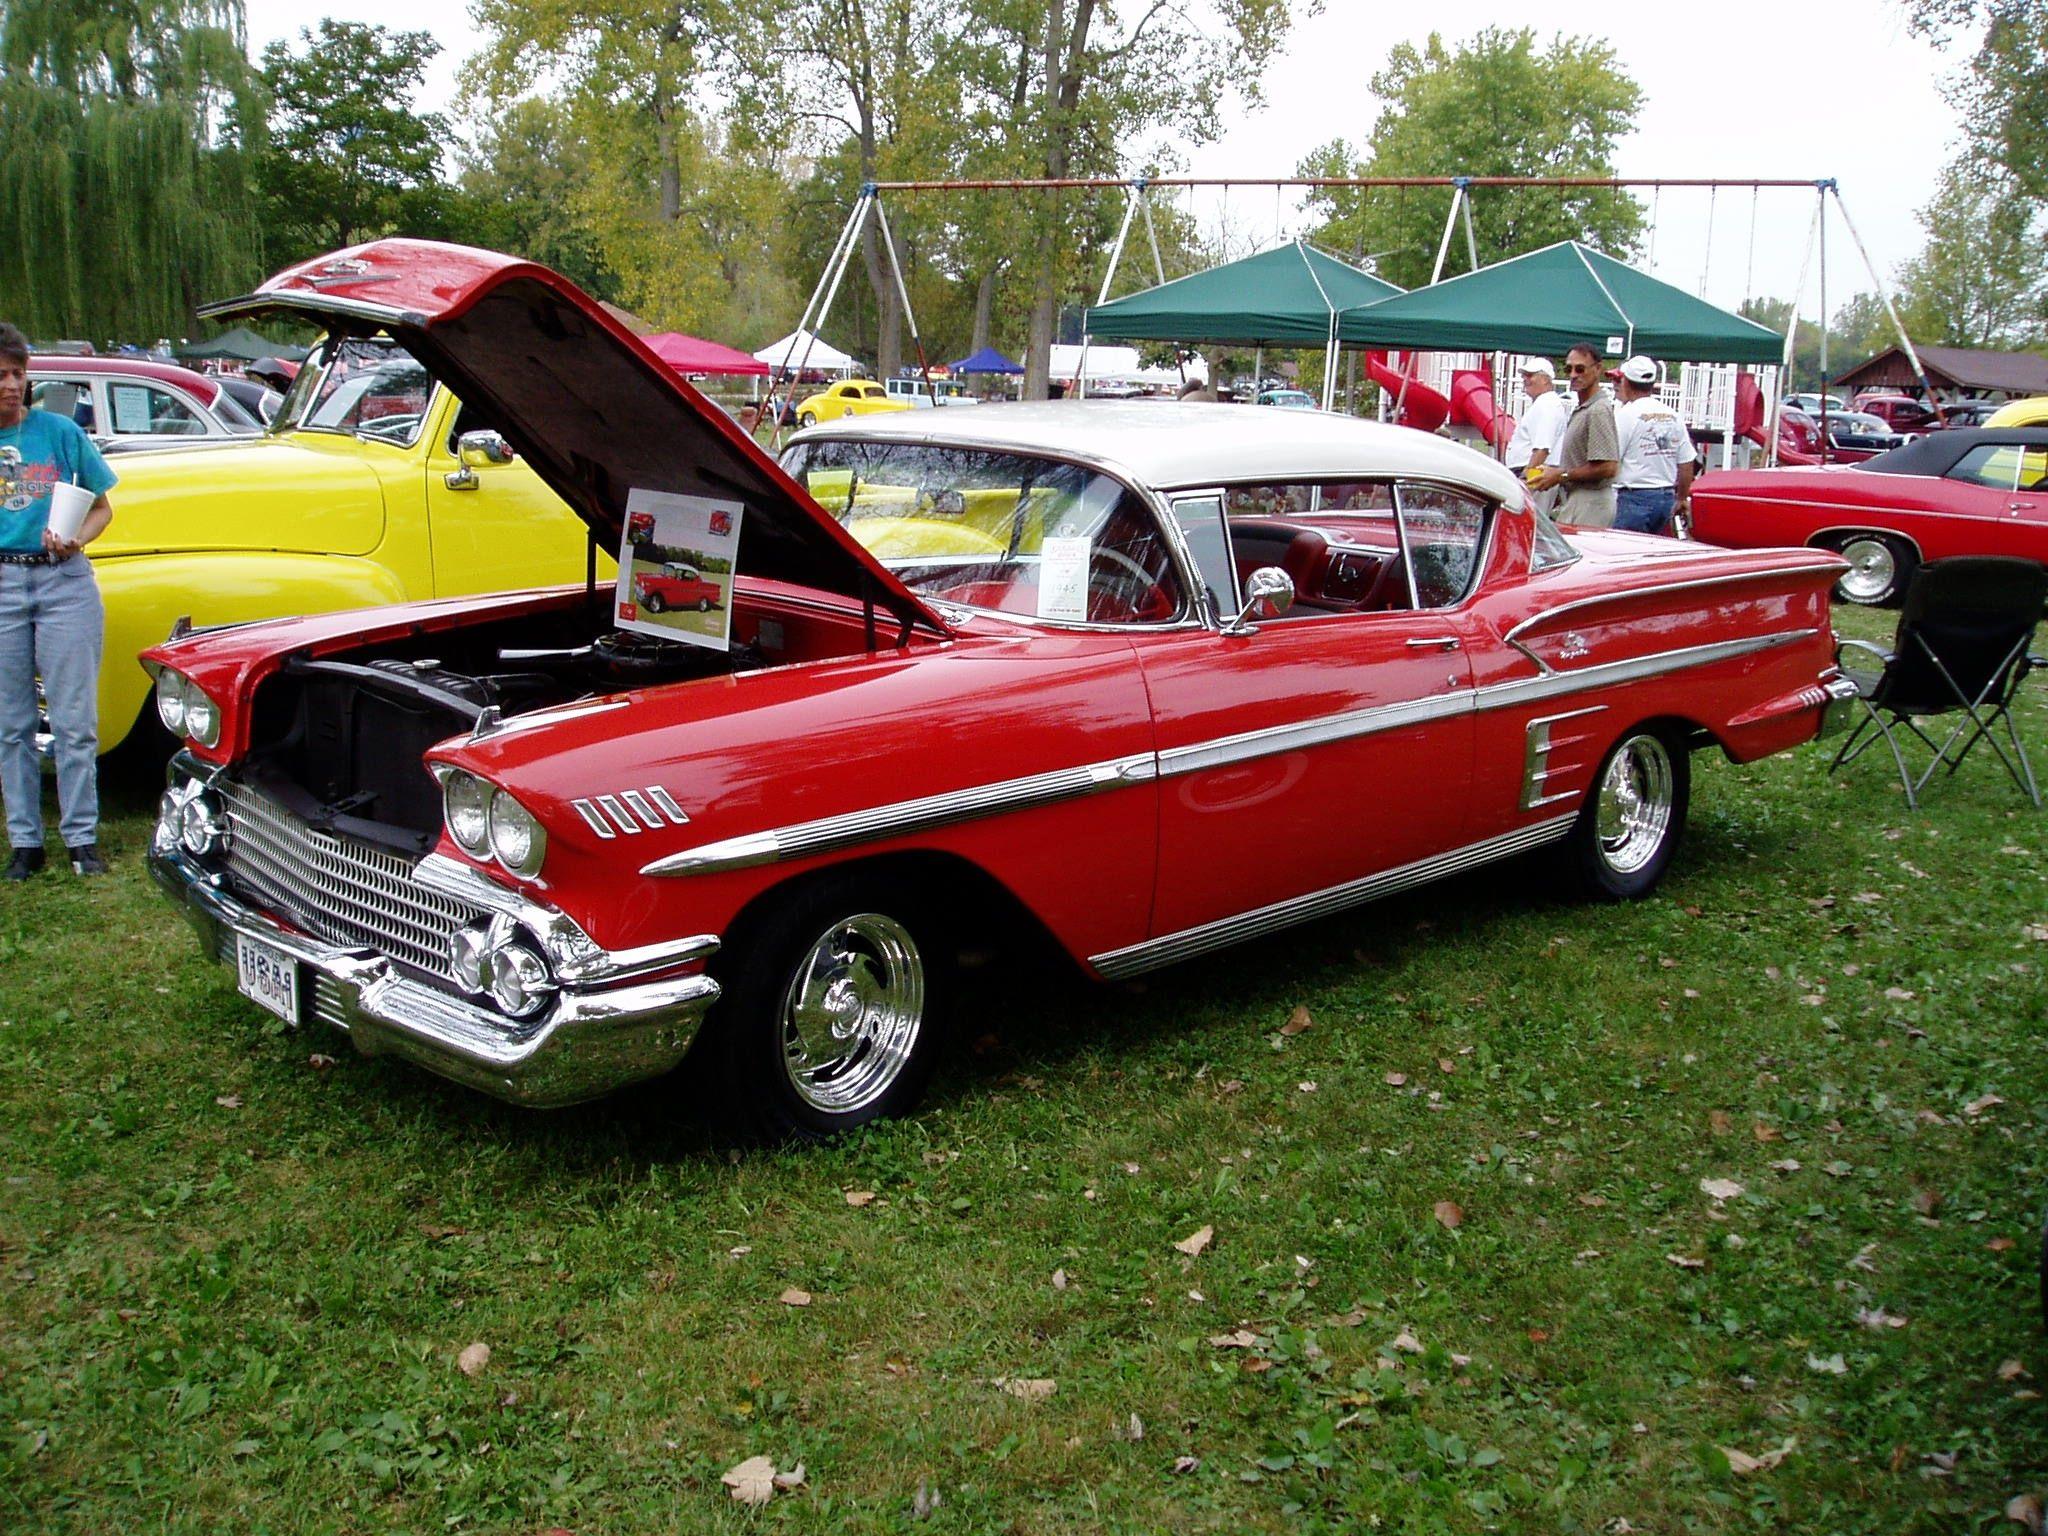 58 Impala 1958 Chevy Impala Chevrolet Impala Chevy Impala